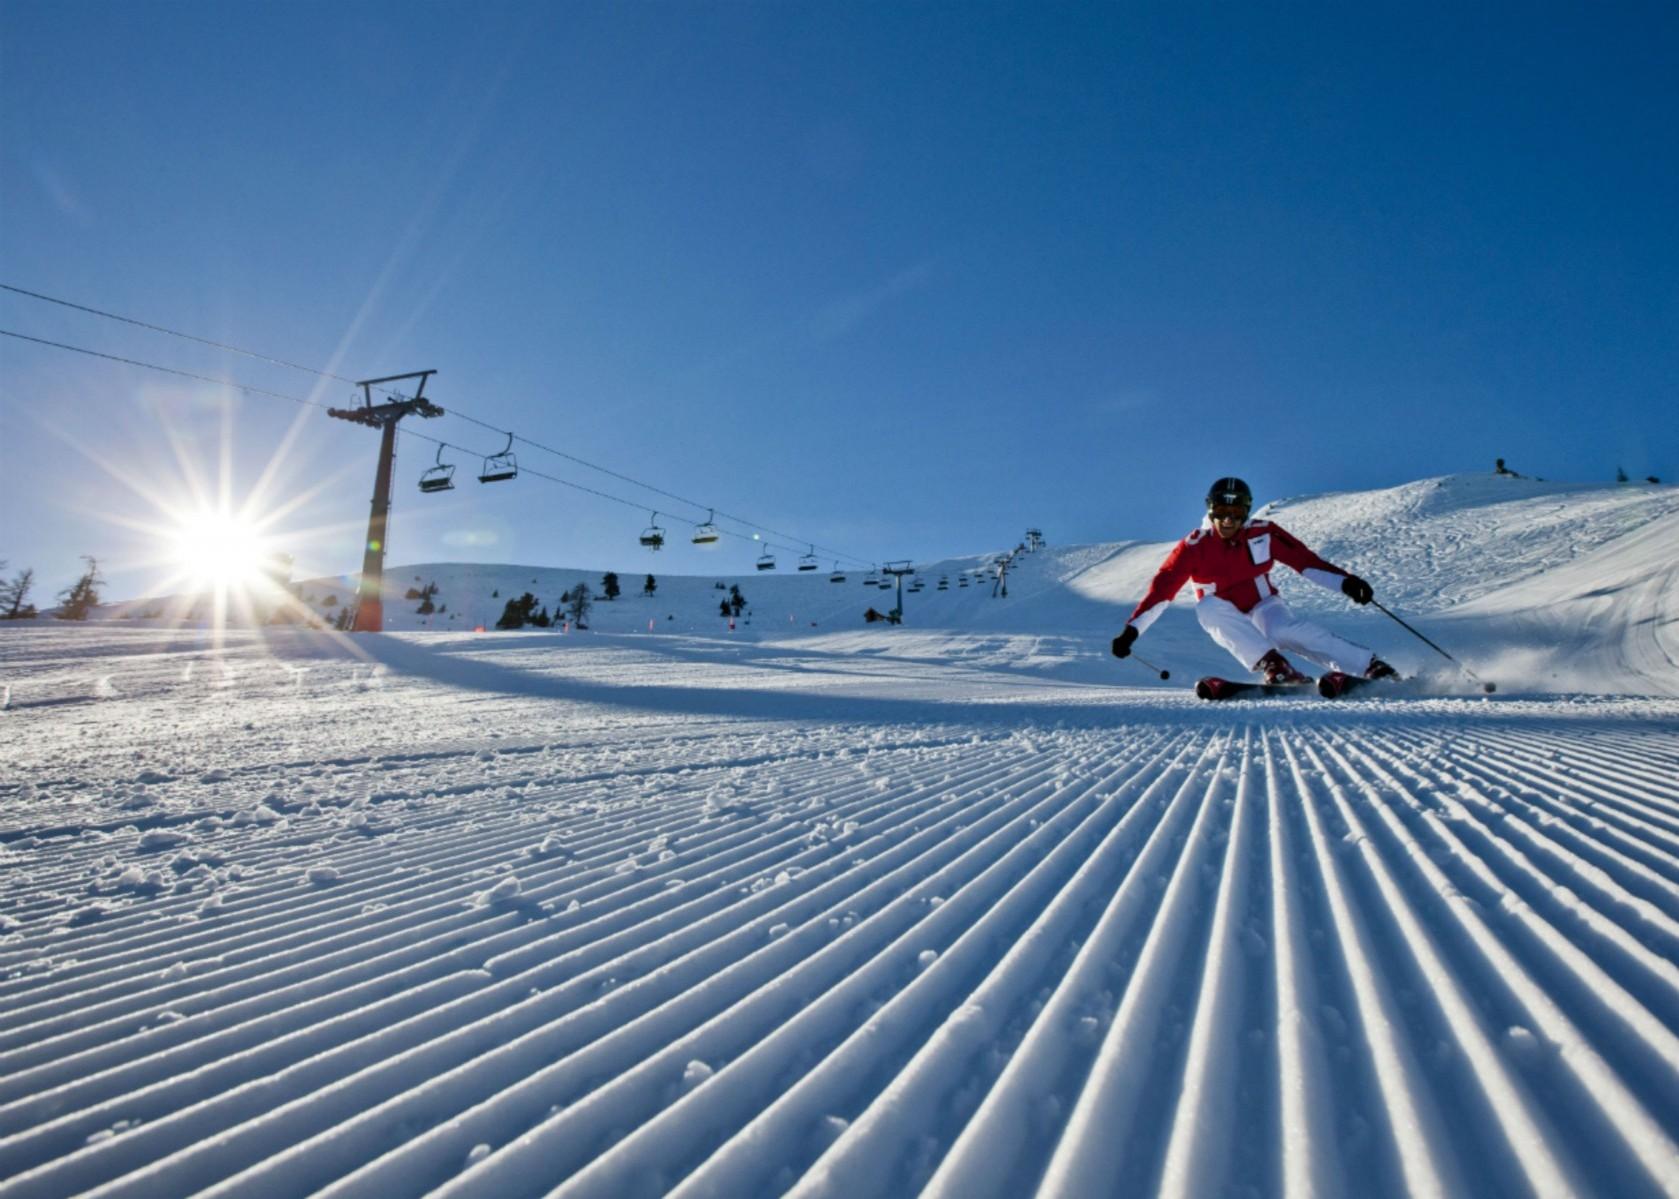 Skiliftkarten Nebensaison in Galsterberg